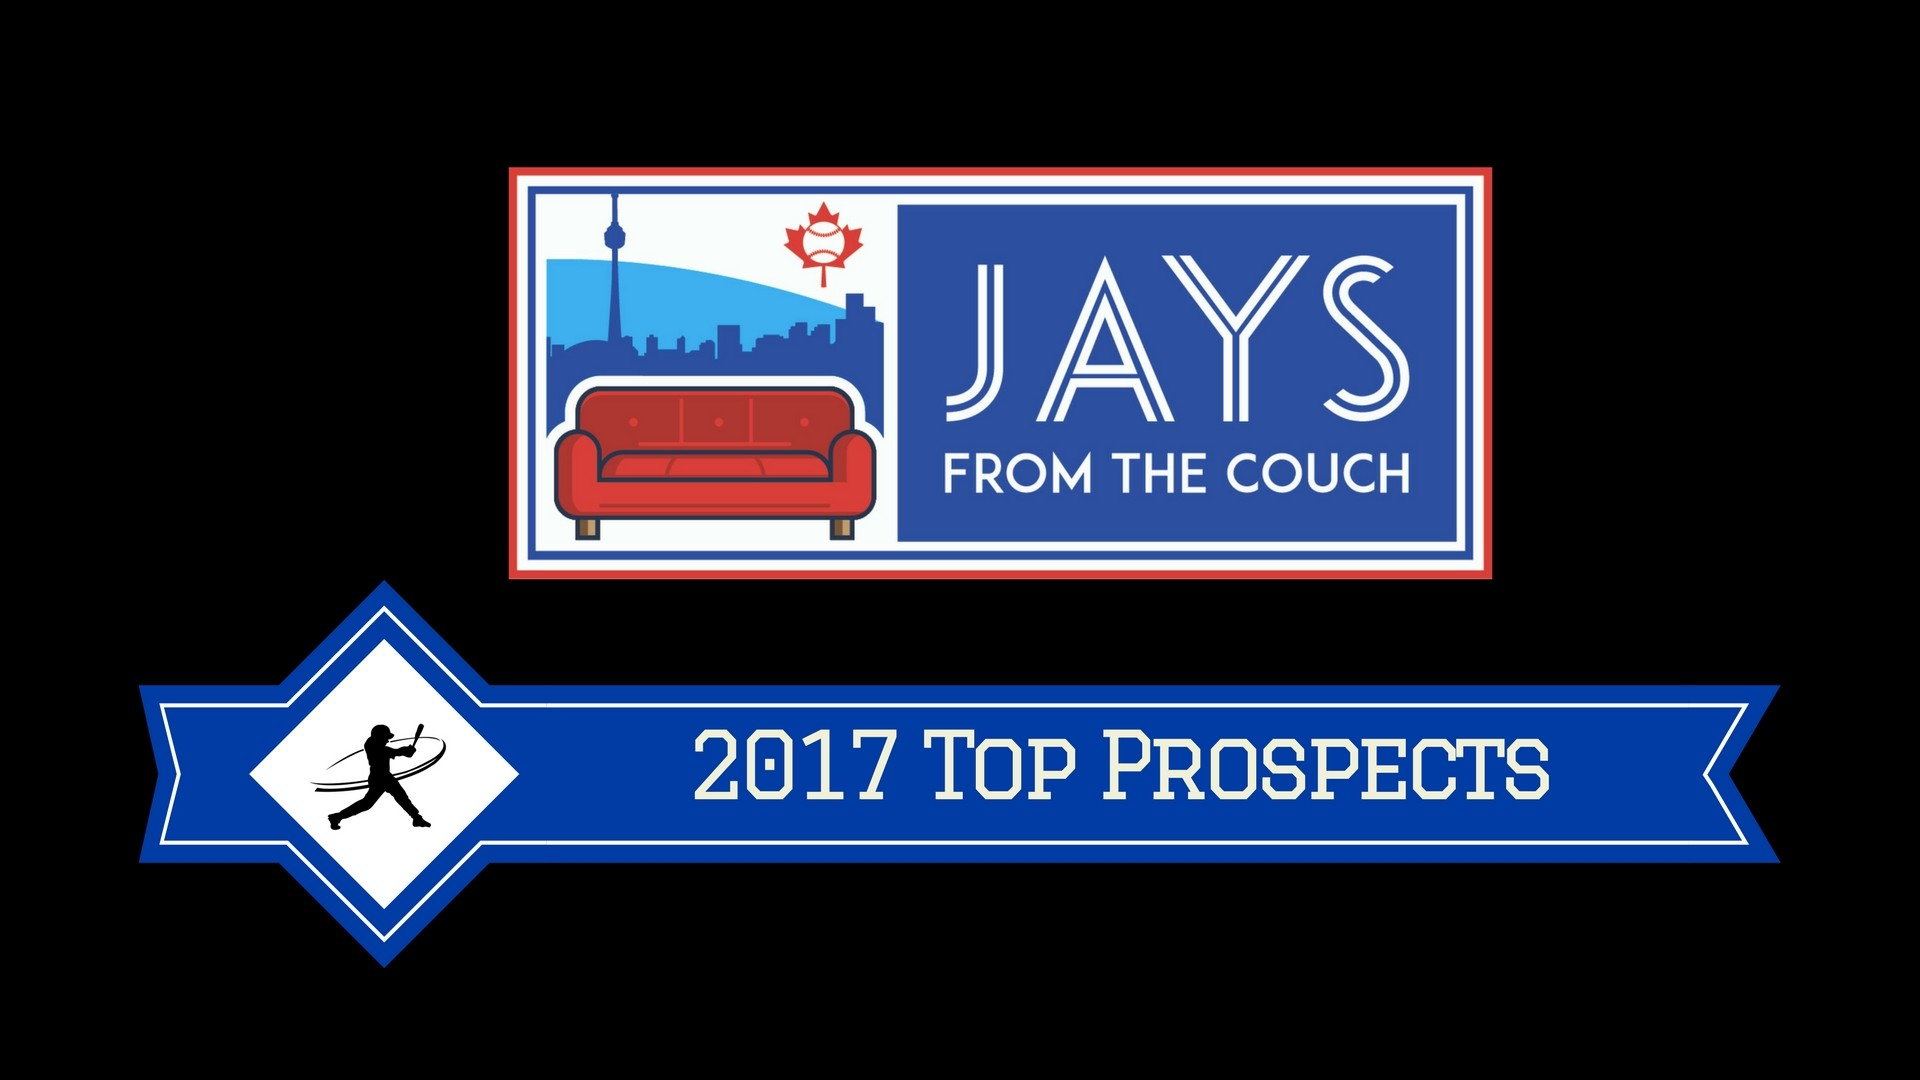 JFtC 2017 Toronto Blue Jays Top Prospects #12 Reese McGuire